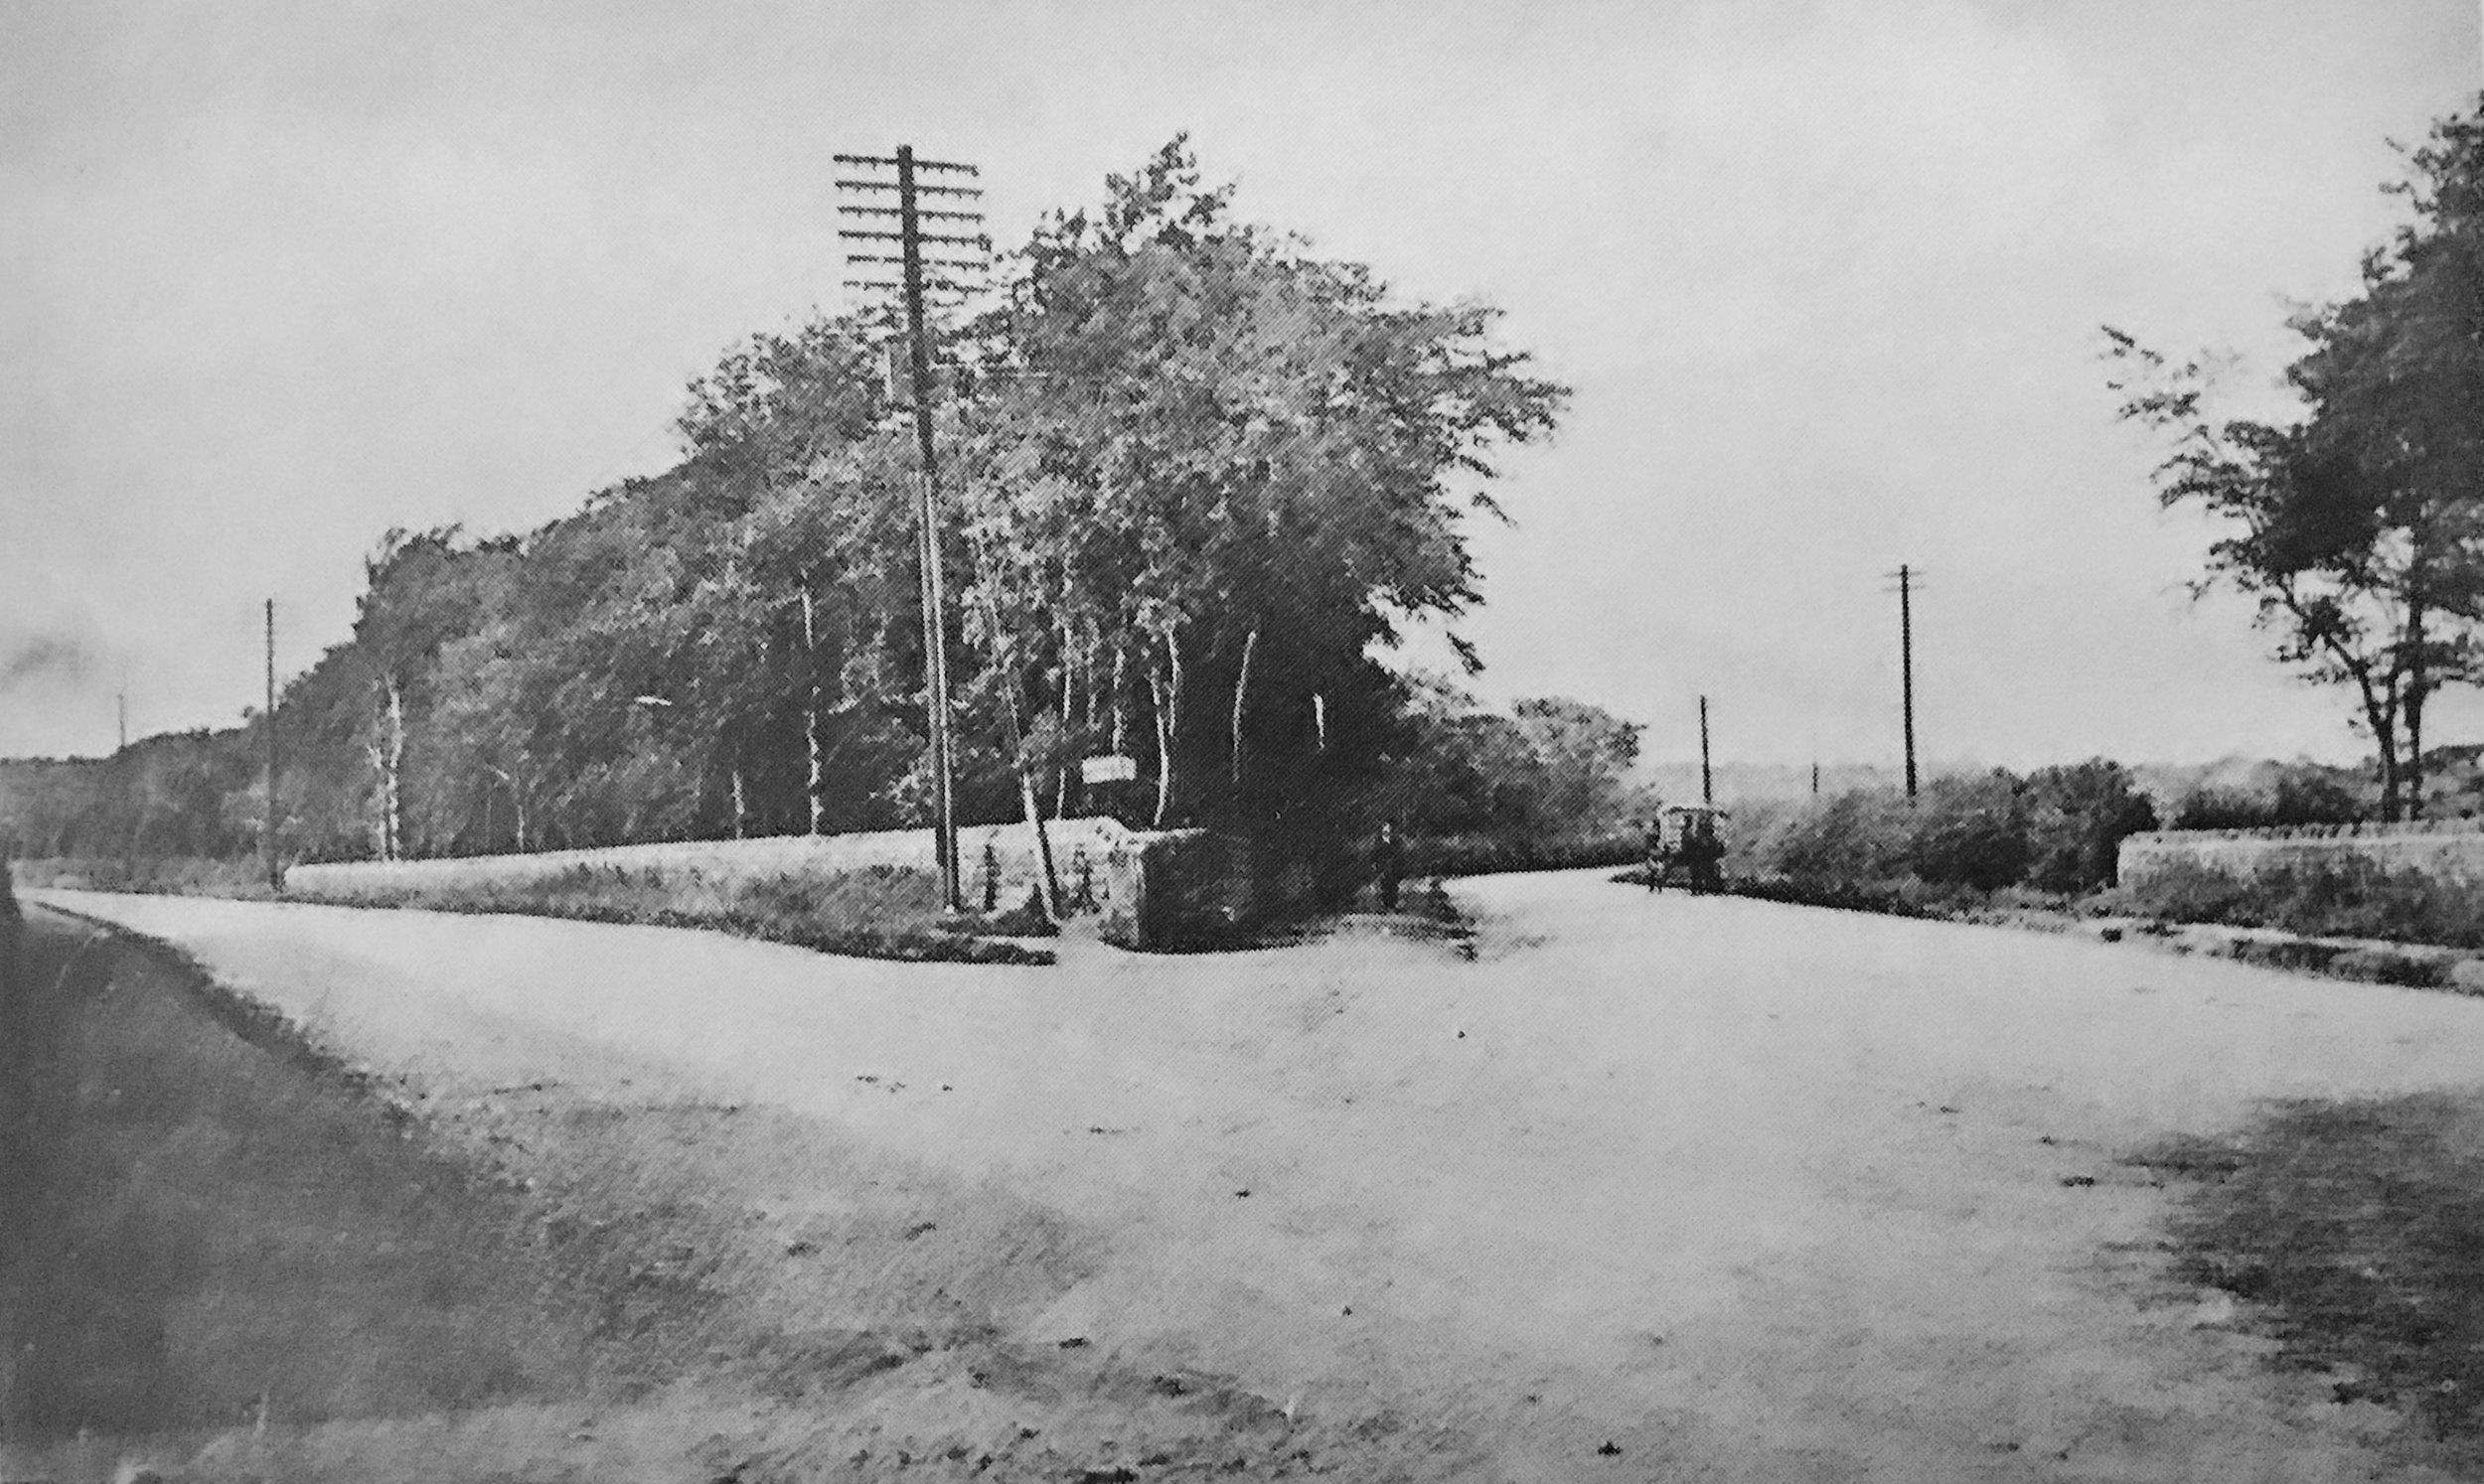 Otley Road / Otley Old Road Junction